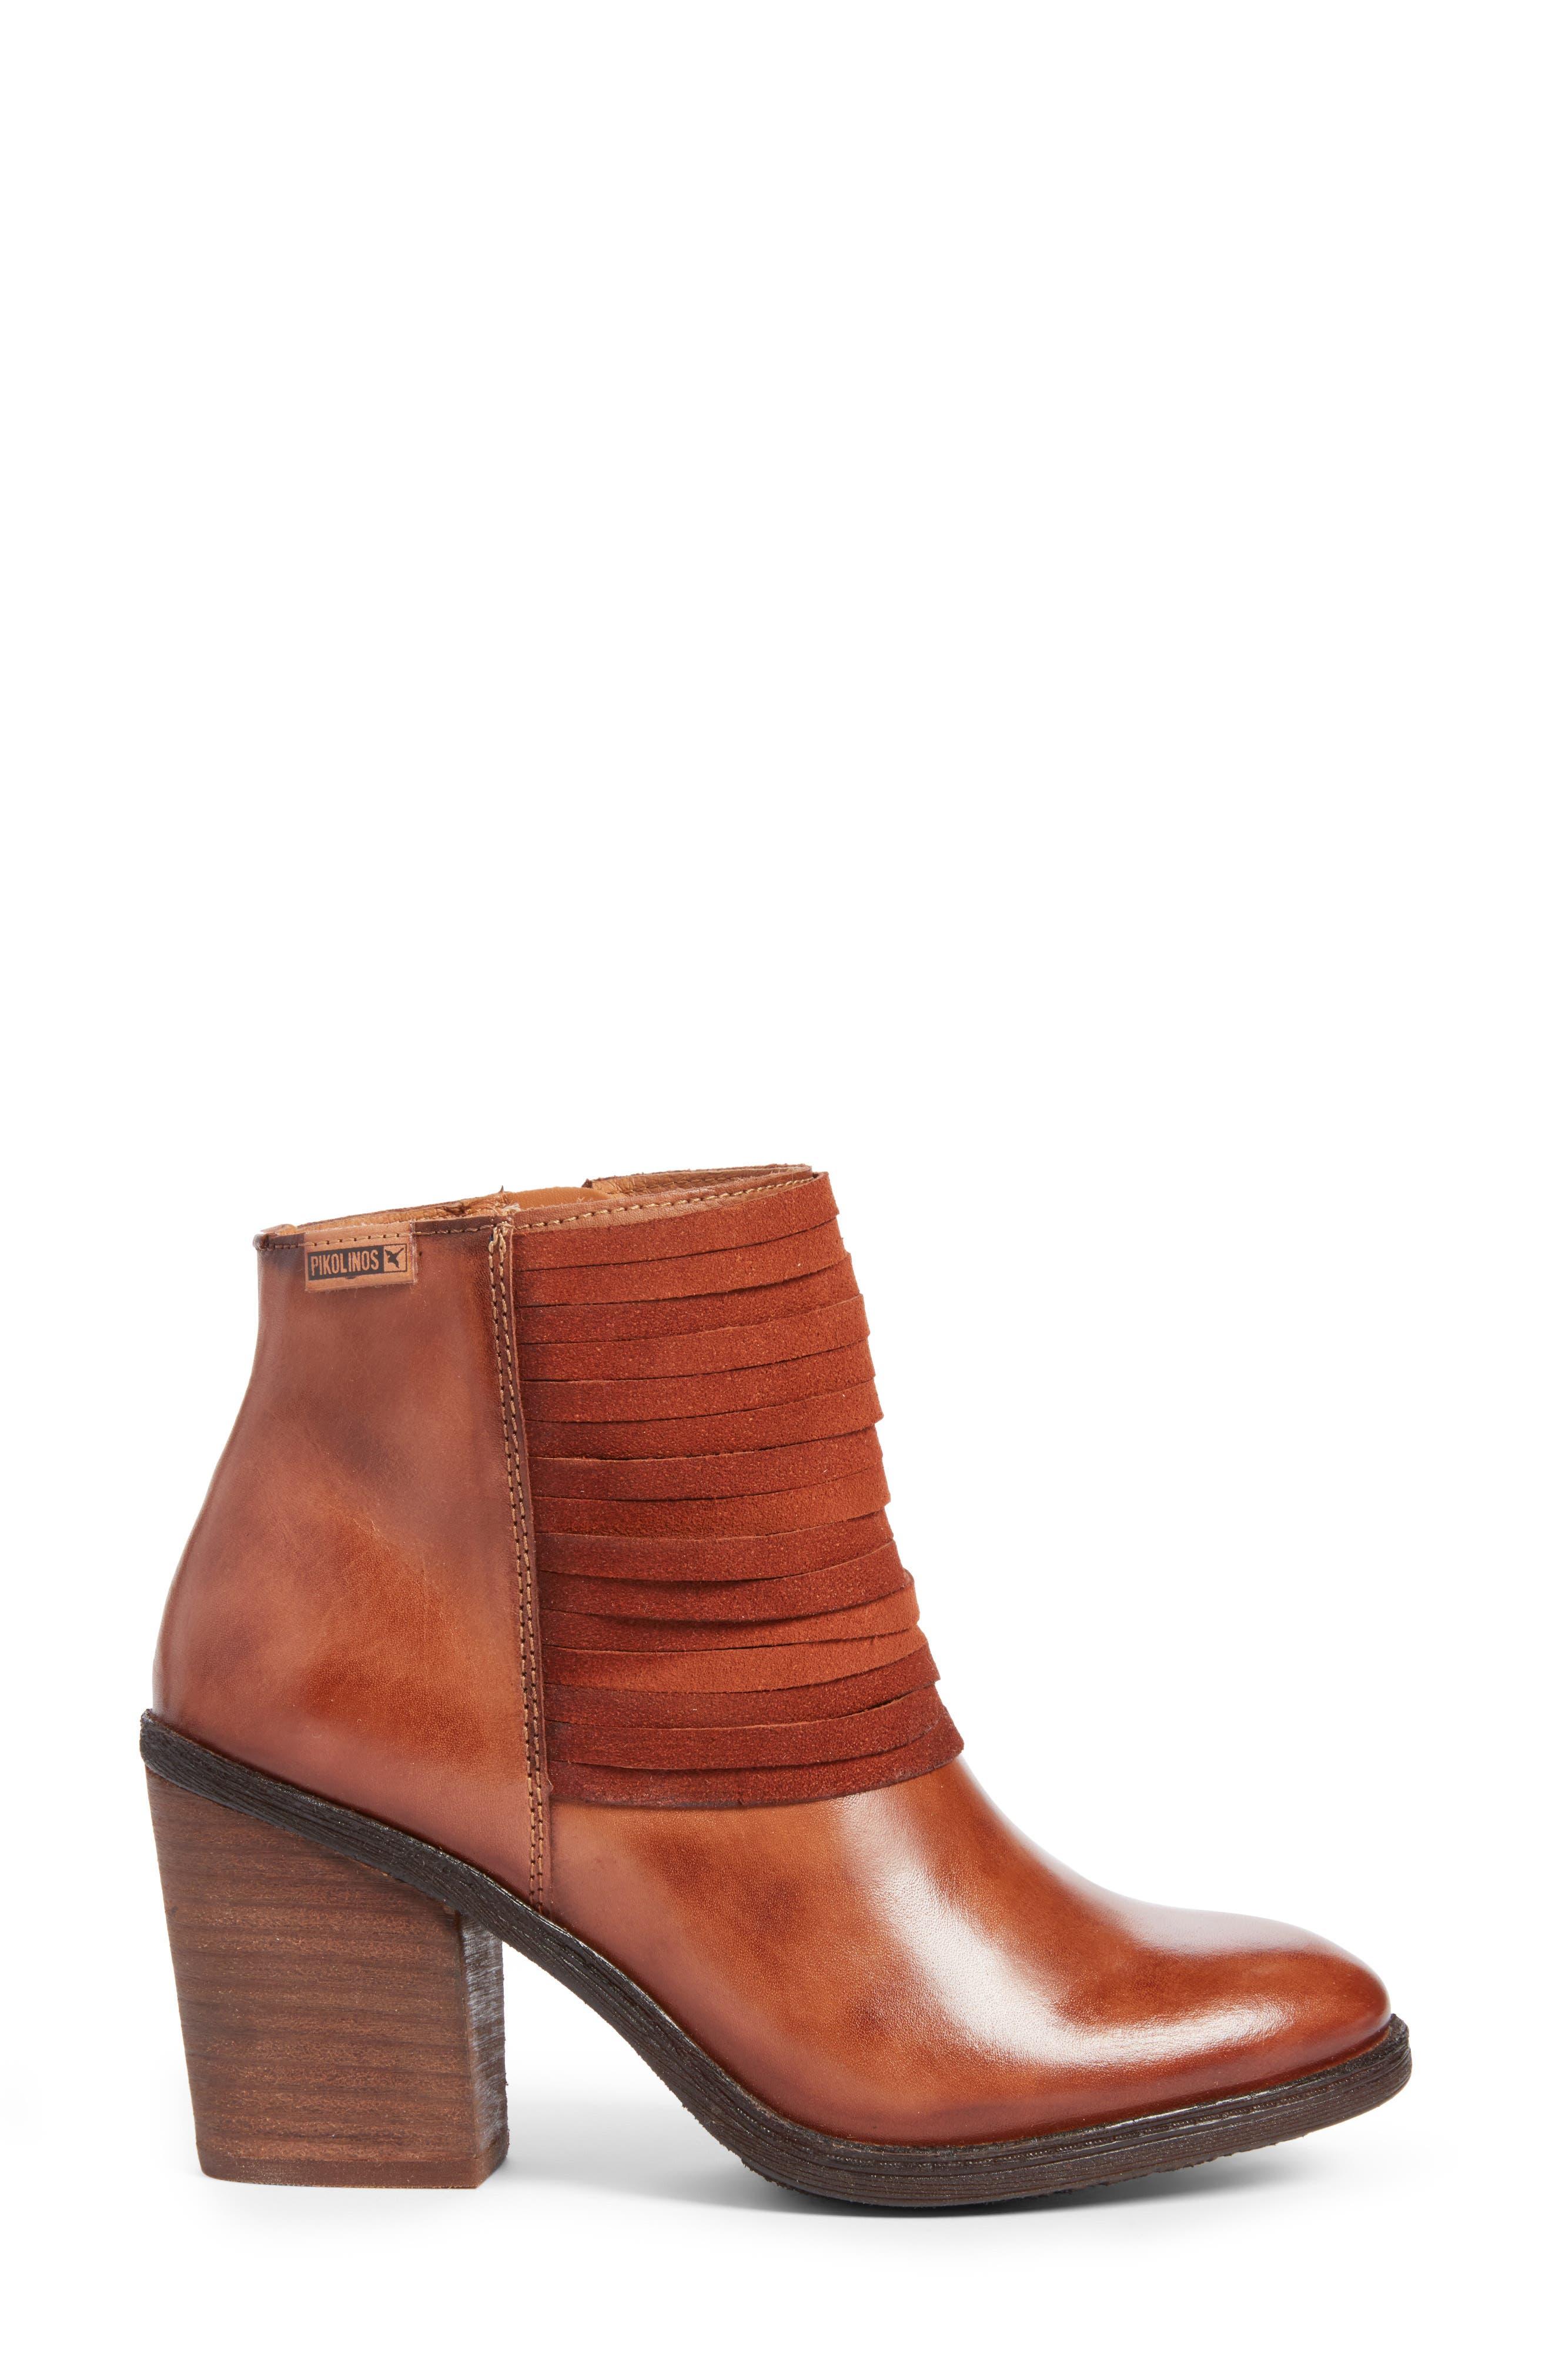 Alicante Bootie,                             Alternate thumbnail 3, color,                             Cuero Leather